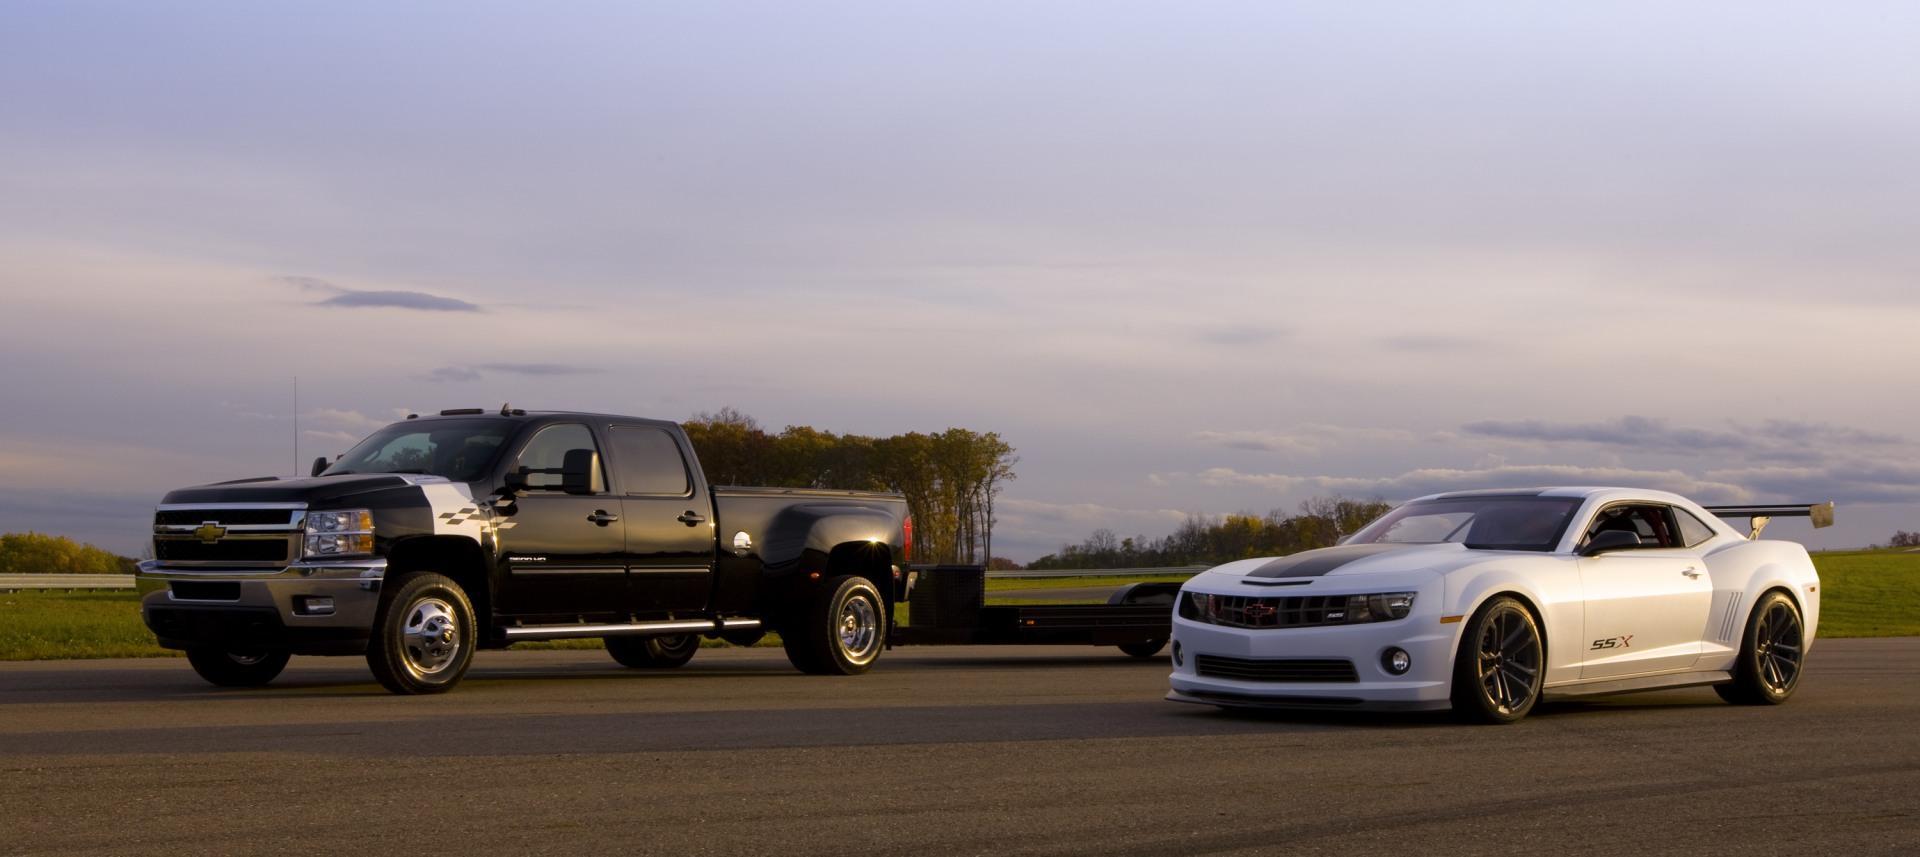 Car Burnout Stock Footage Video | Shutterstock